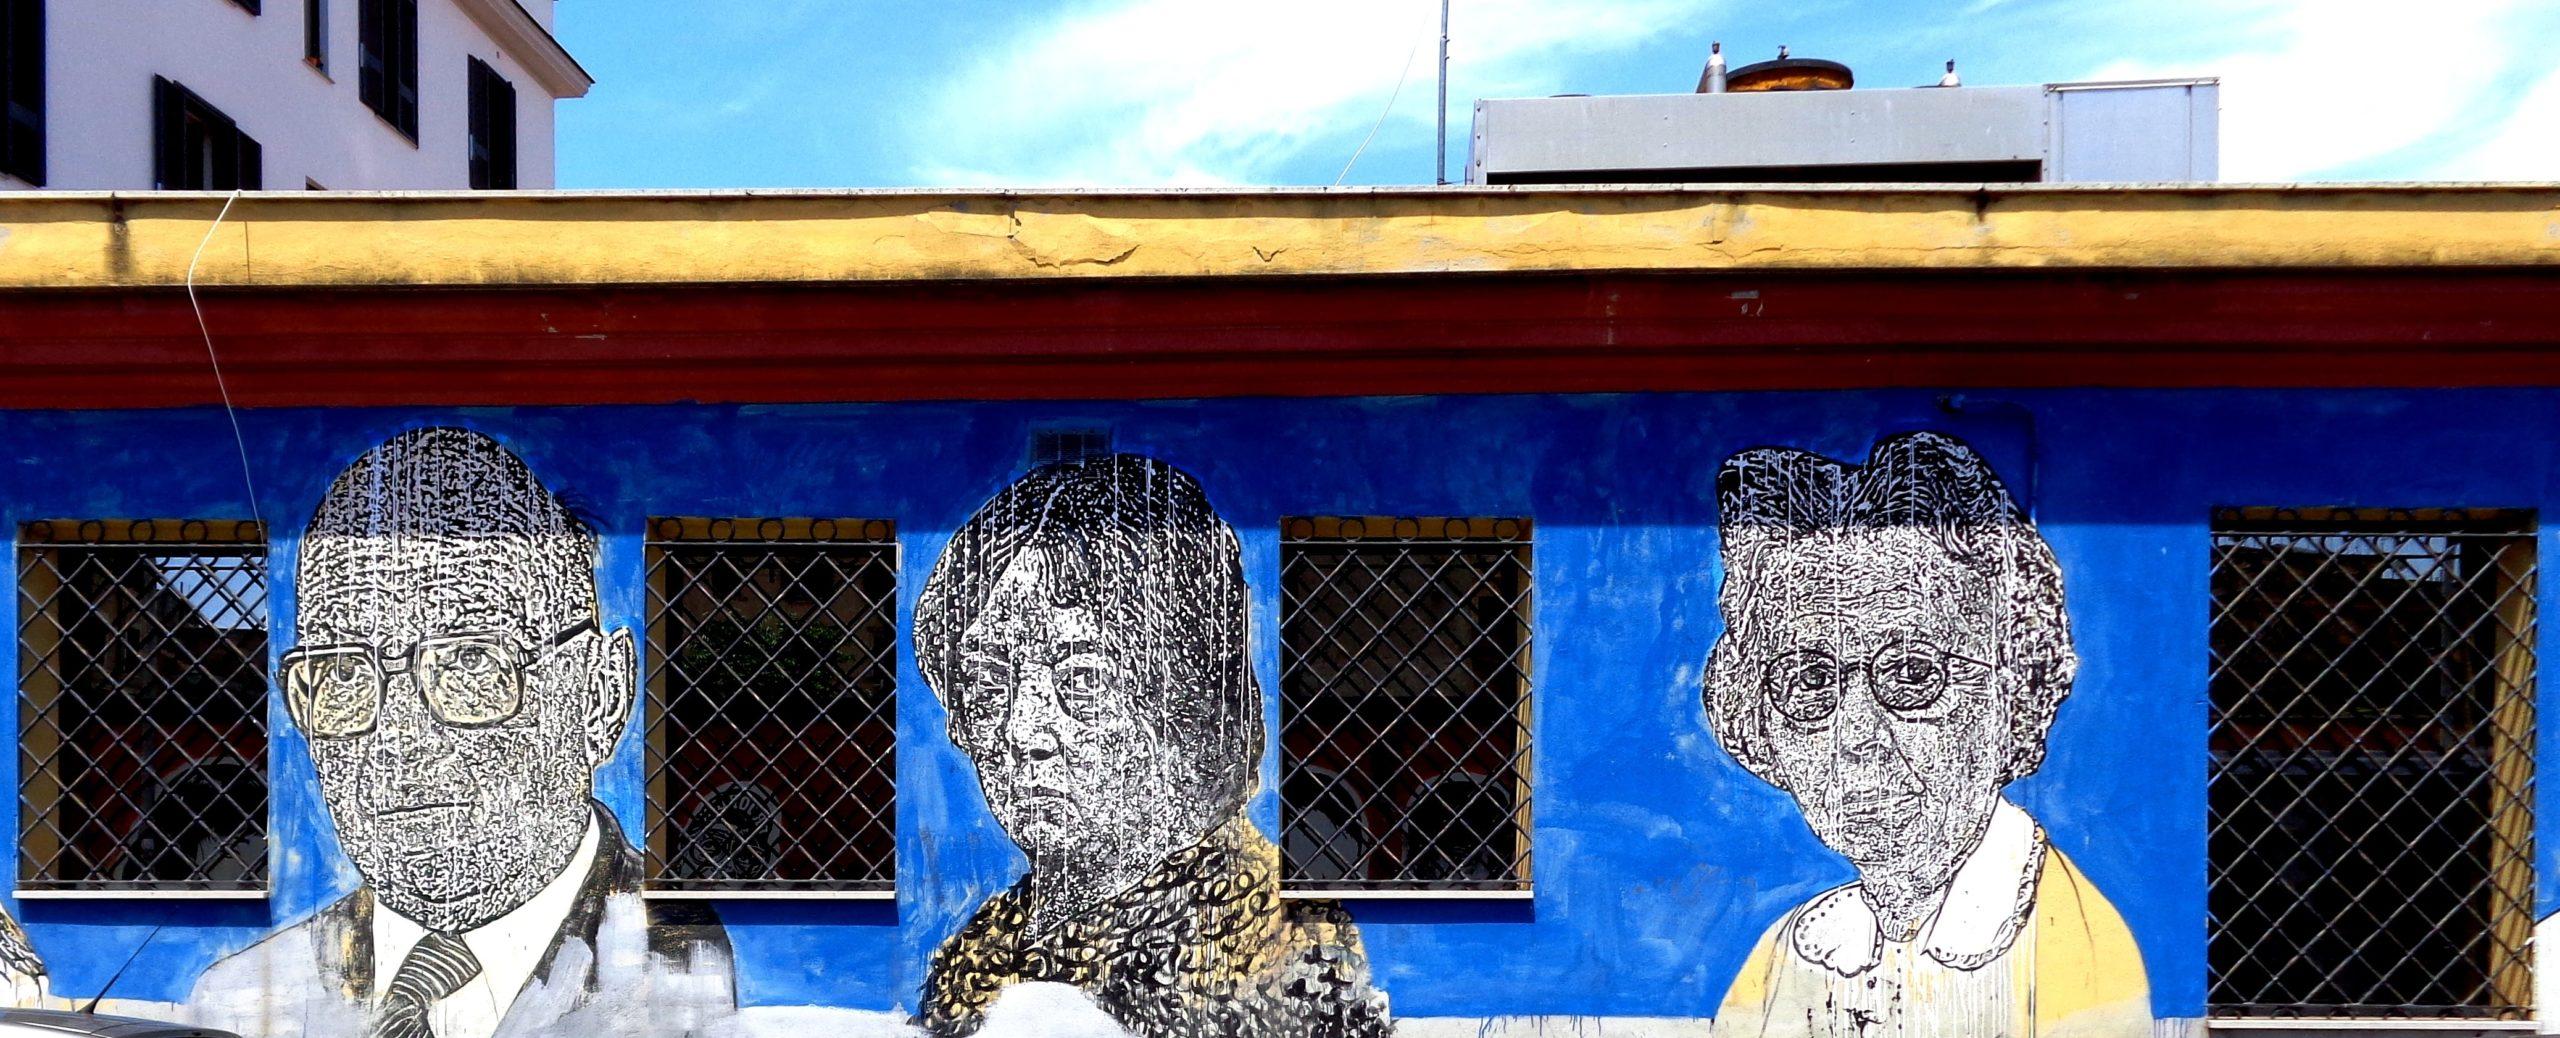 sten&lex street art via dei magazzini generali ostiense rome